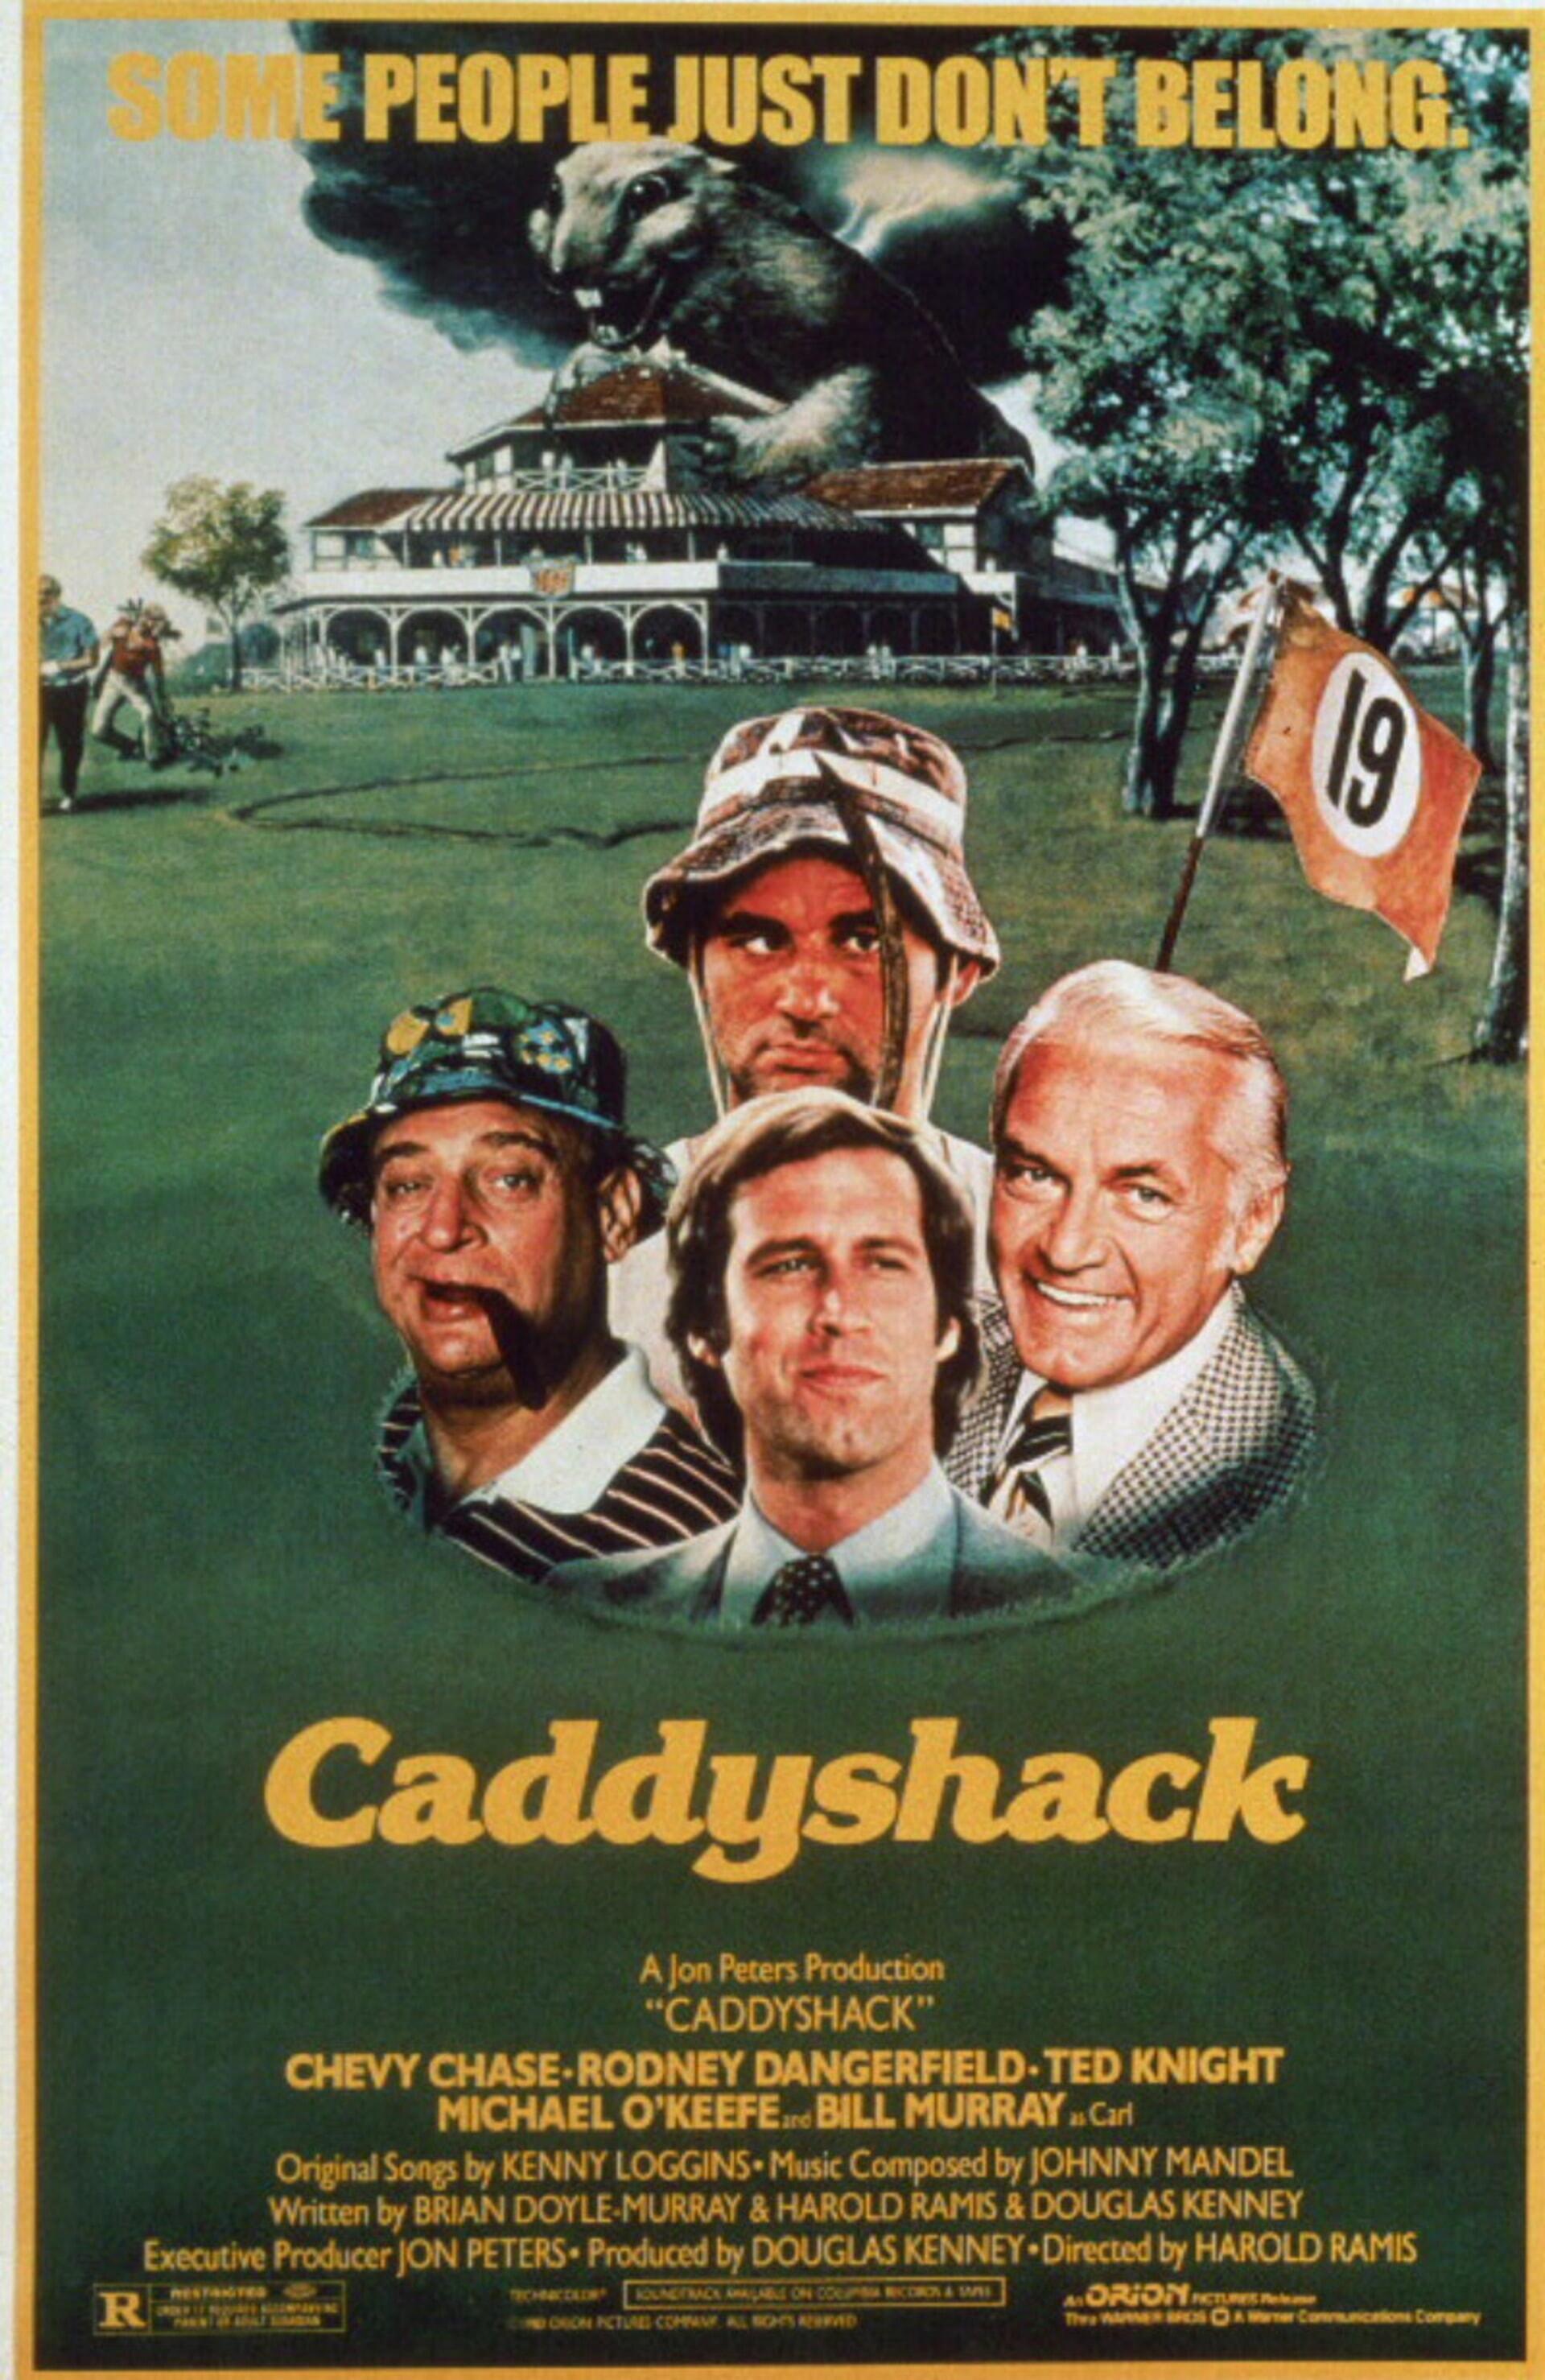 Caddyshack - Poster 1